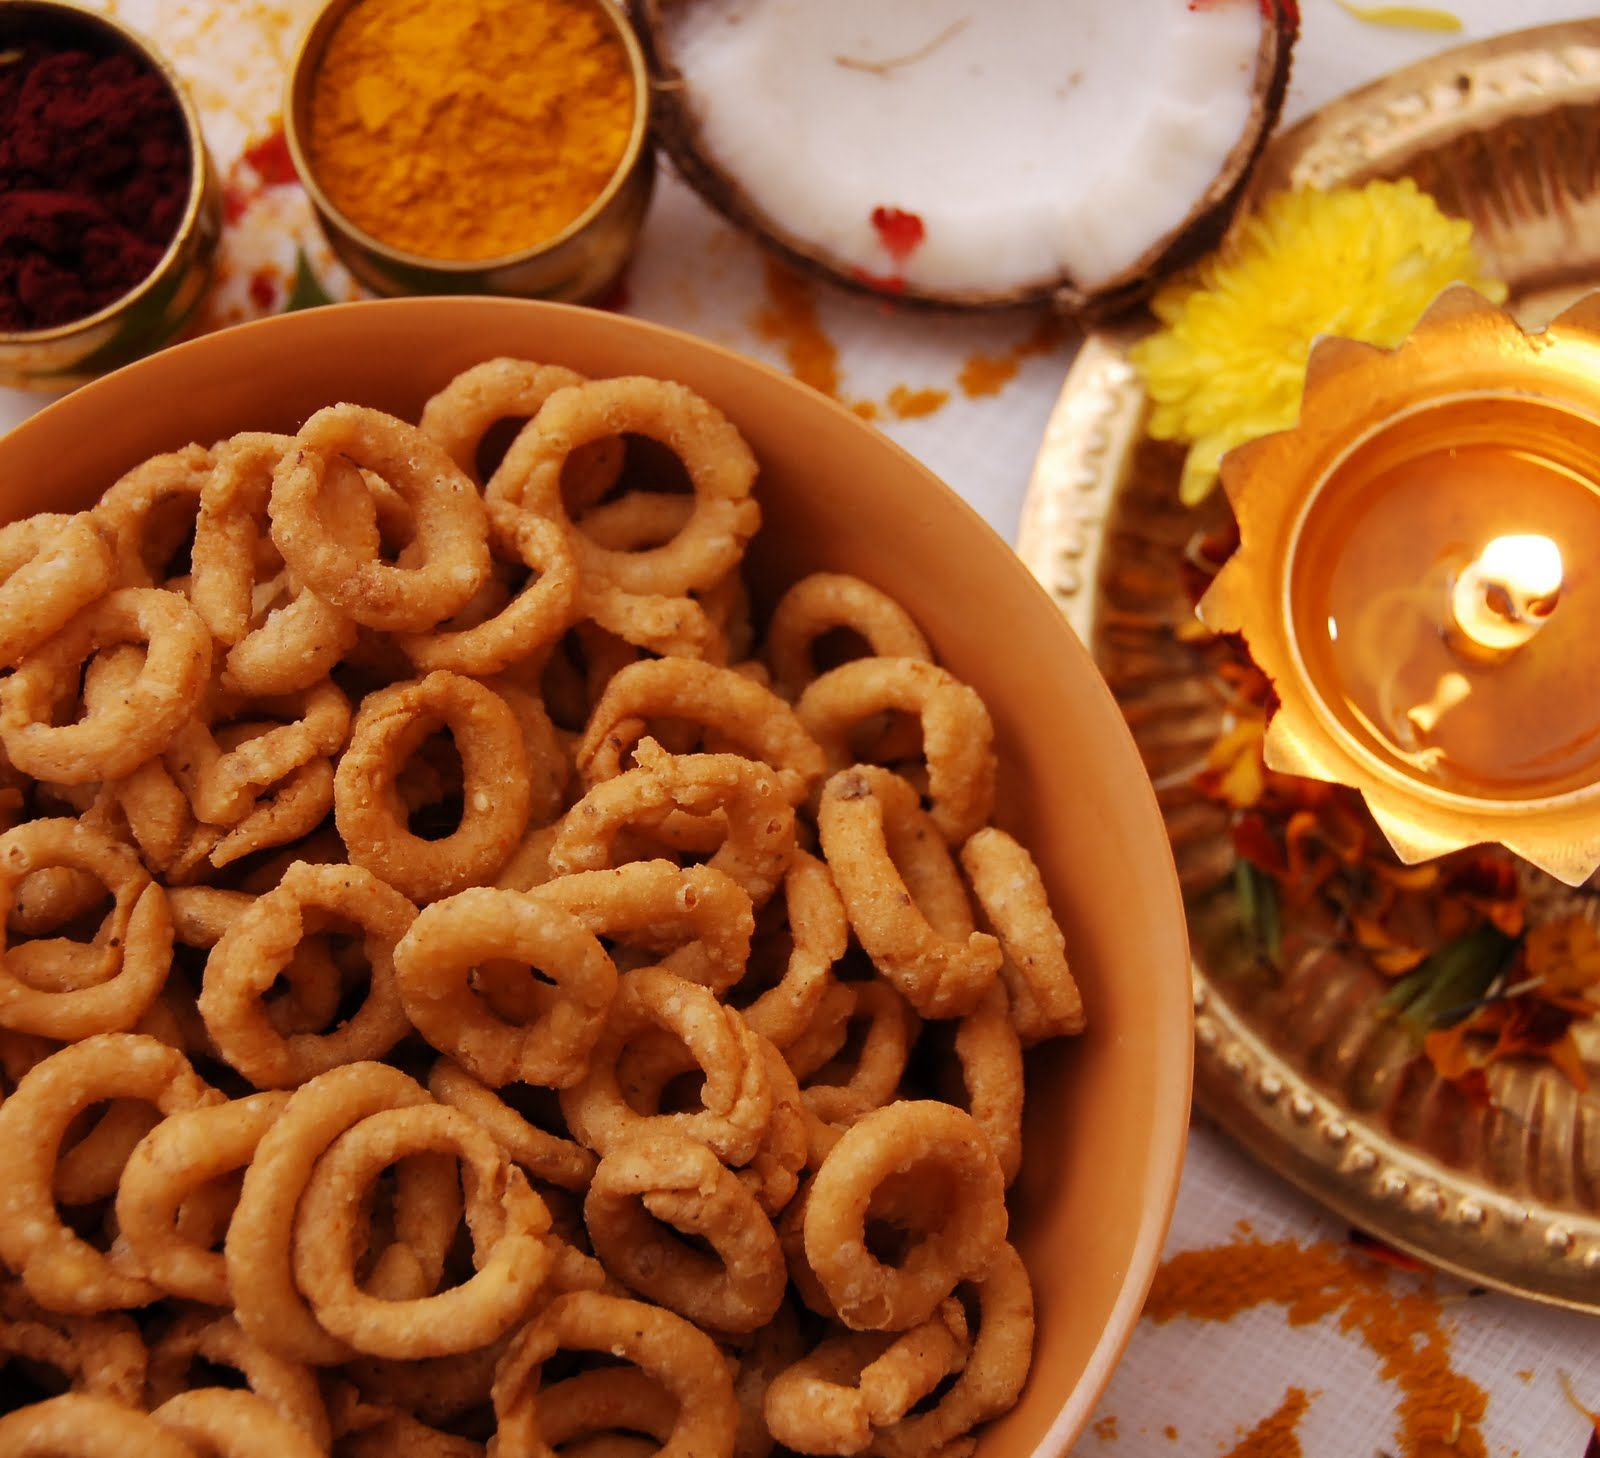 Kobbari chegodilu diwali savoury snacks recipe from the blog archive of indian snack foods recipes indian food raynaovg forumfinder Images